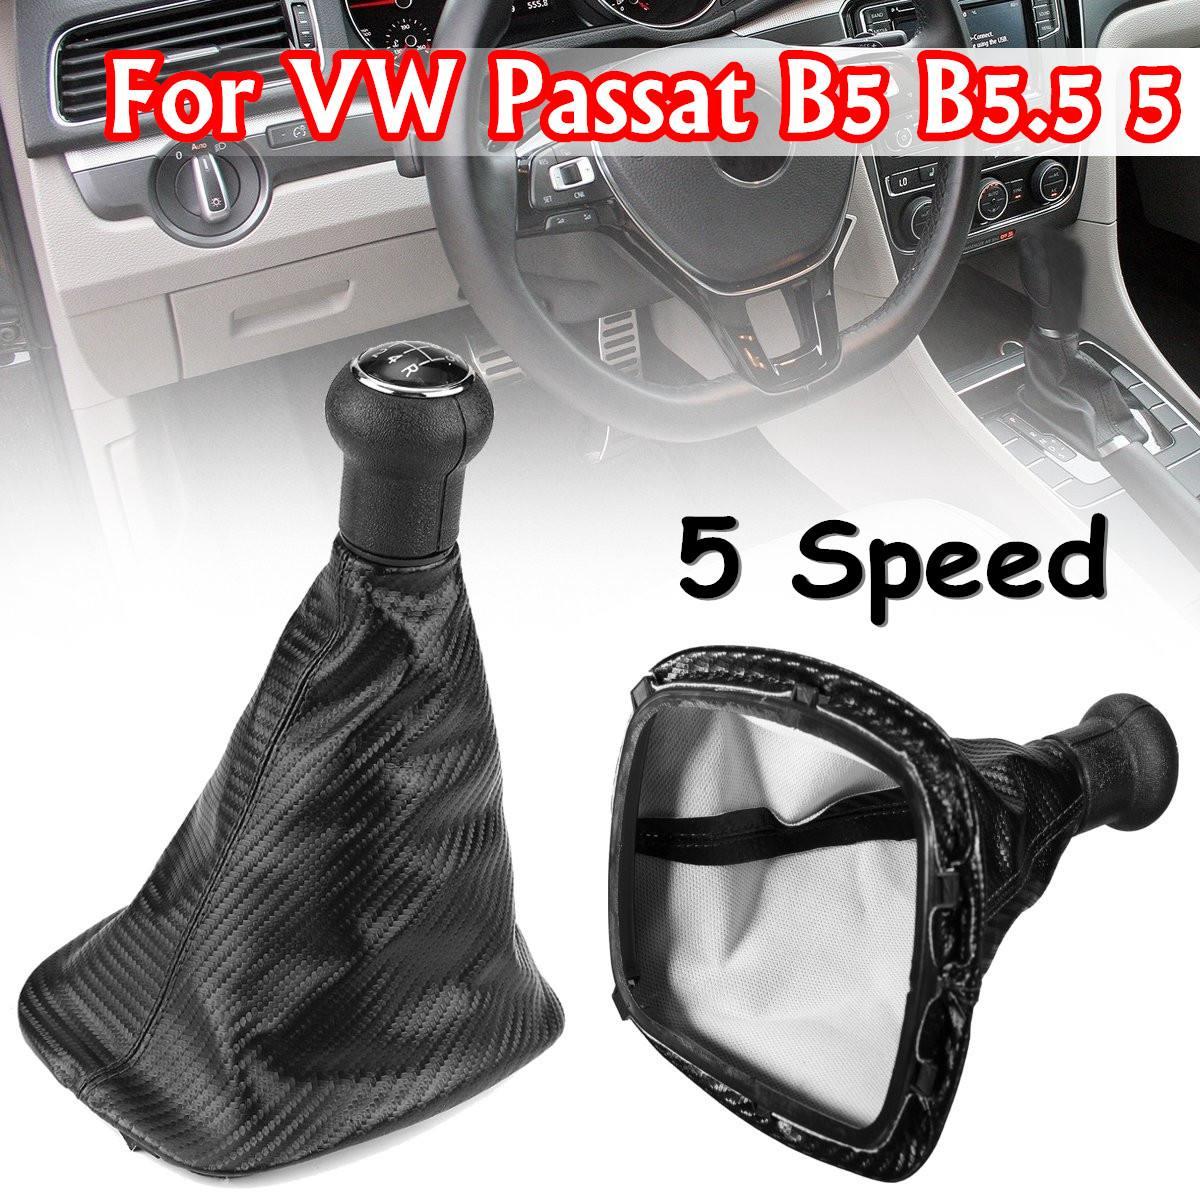 Pomo de cambio de marchas de fibra de carbono de 5 velocidades para VW Passat B5 B5.5 Bora Golf